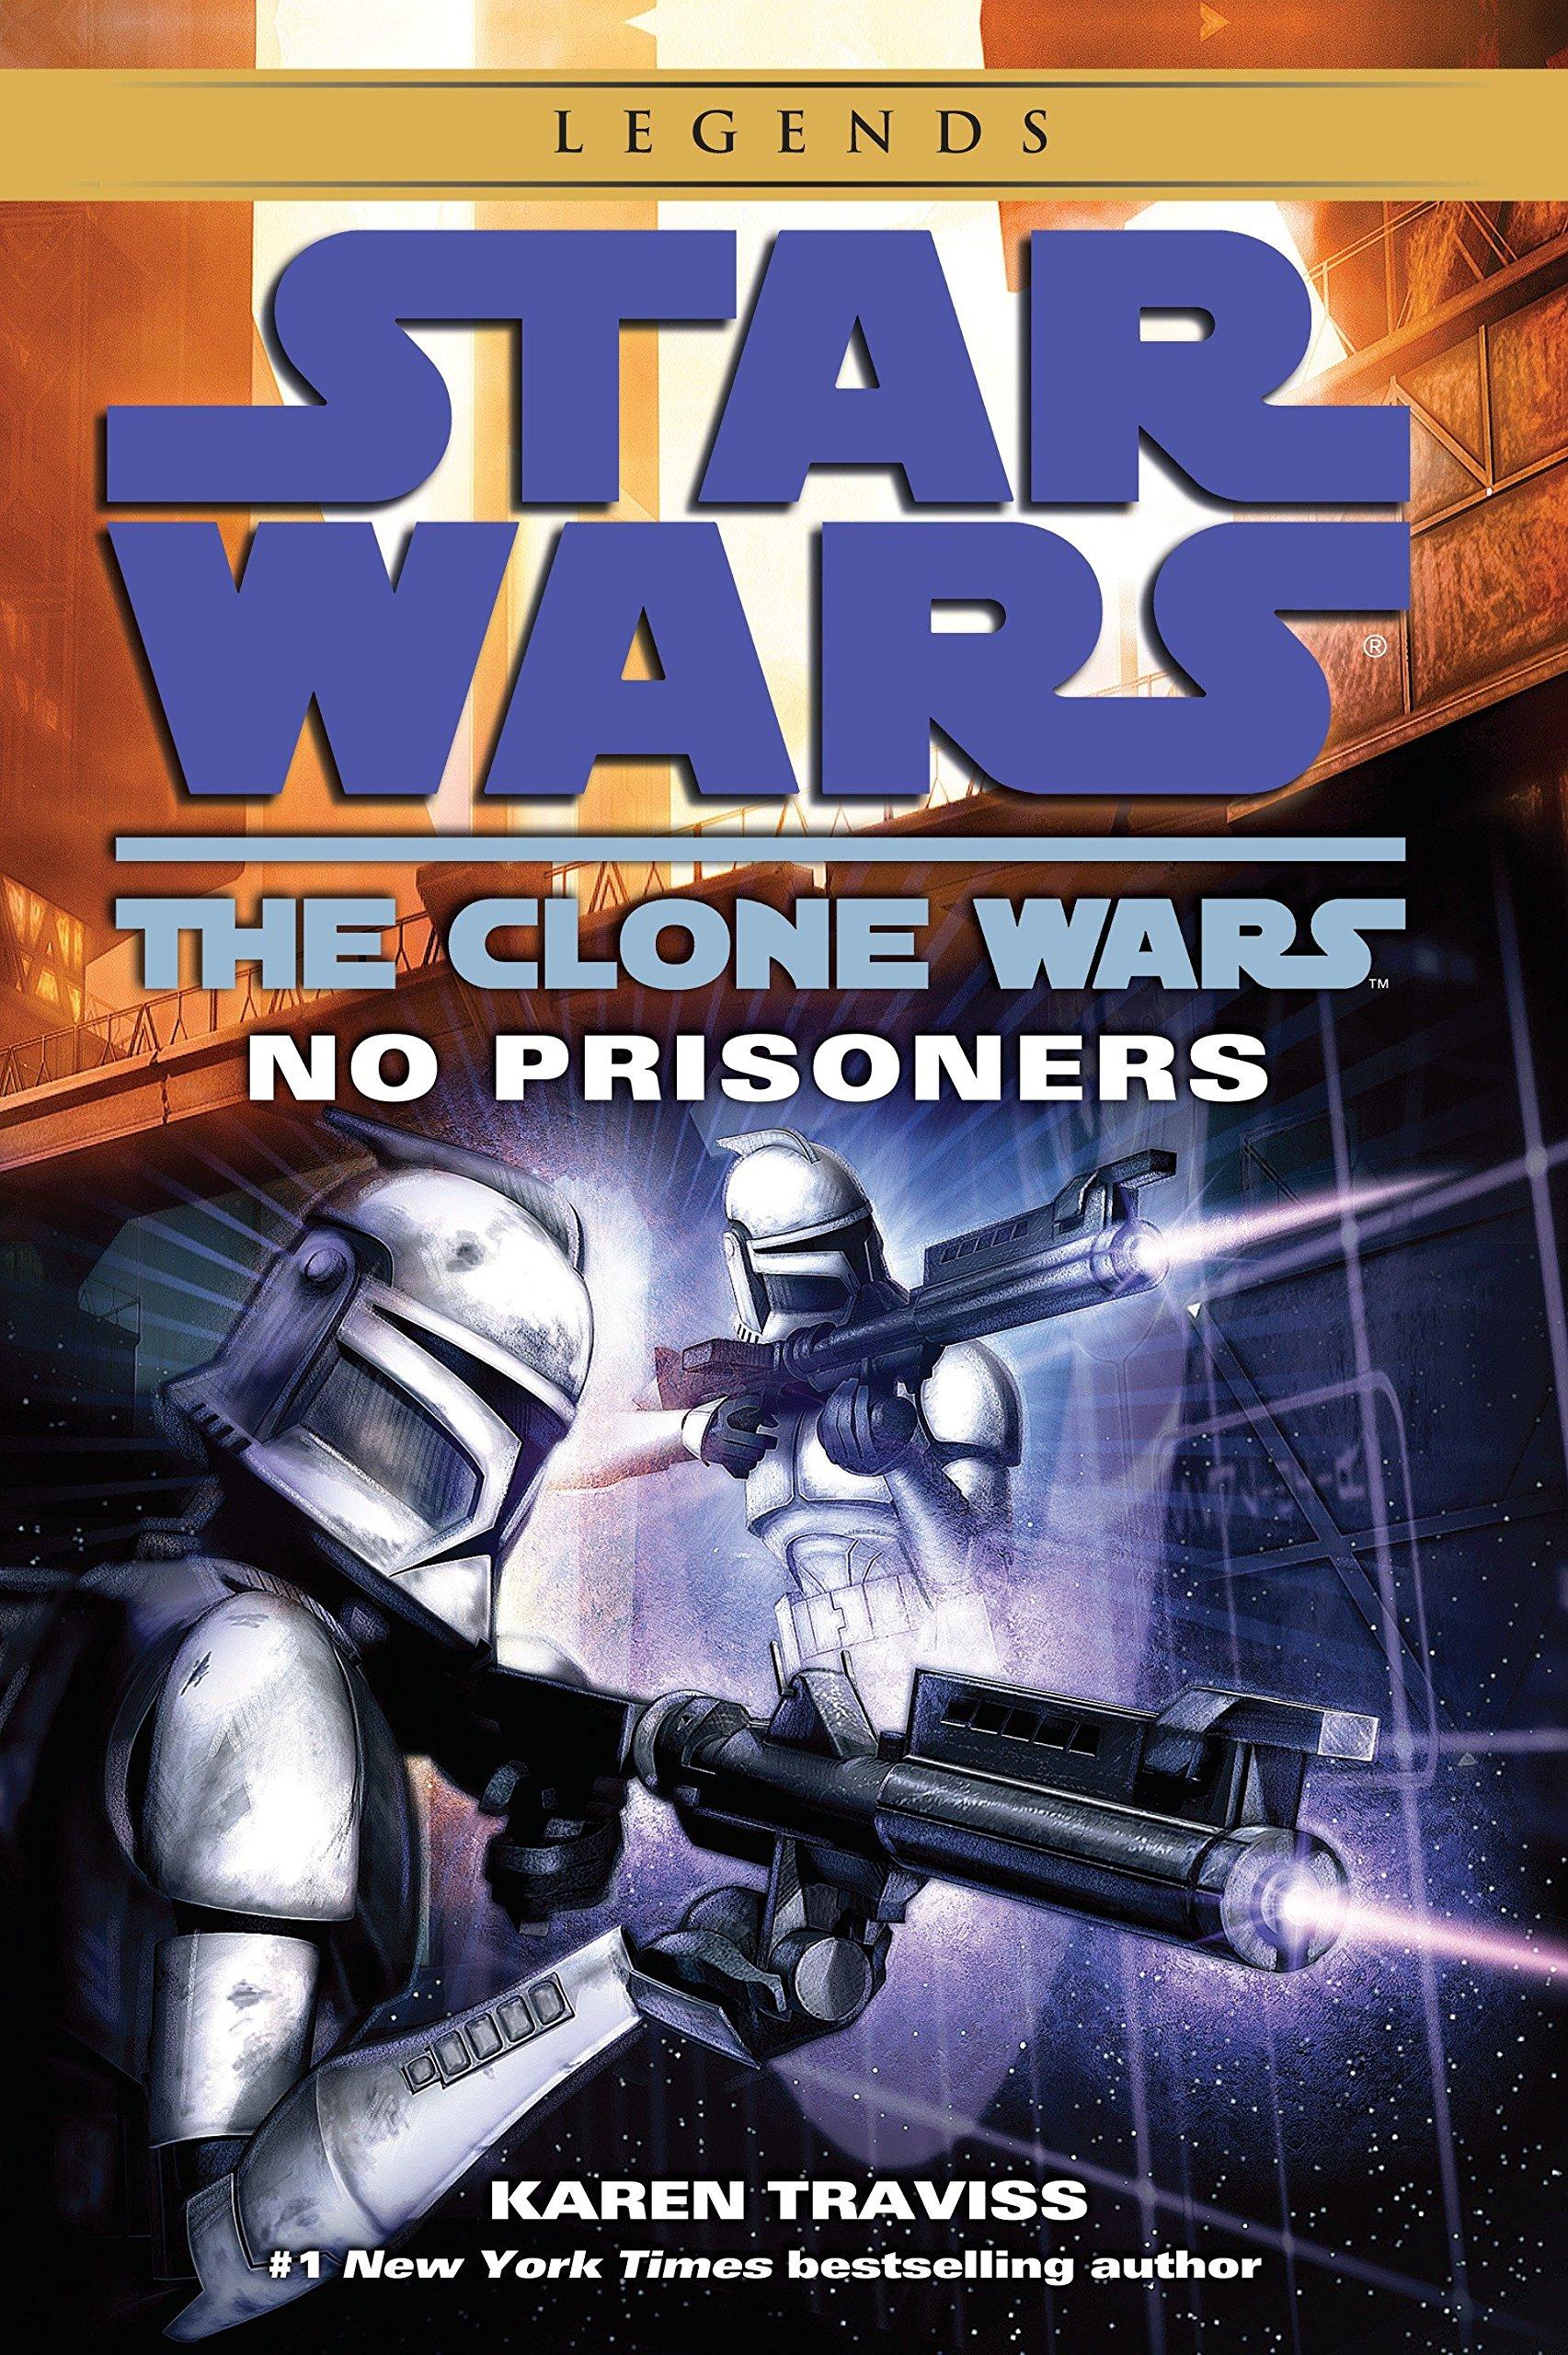 f87a2c890e2 No Prisoners (Star Wars  The Clone Wars)  Karen Traviss ...